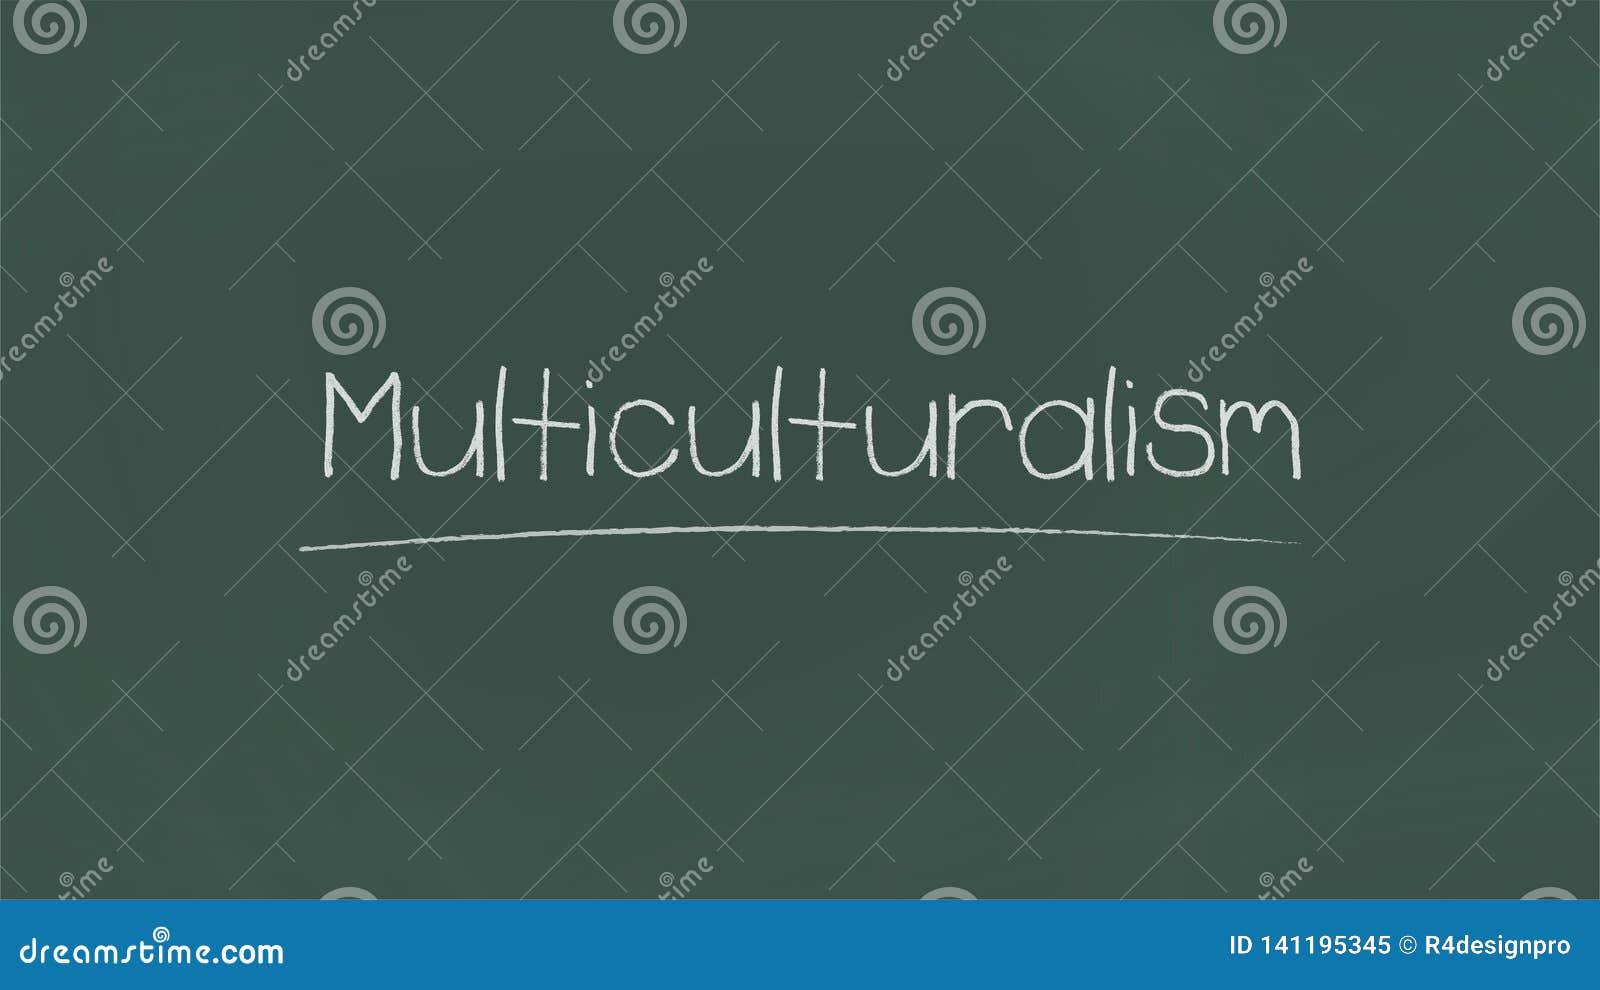 Multikulturalismuswort